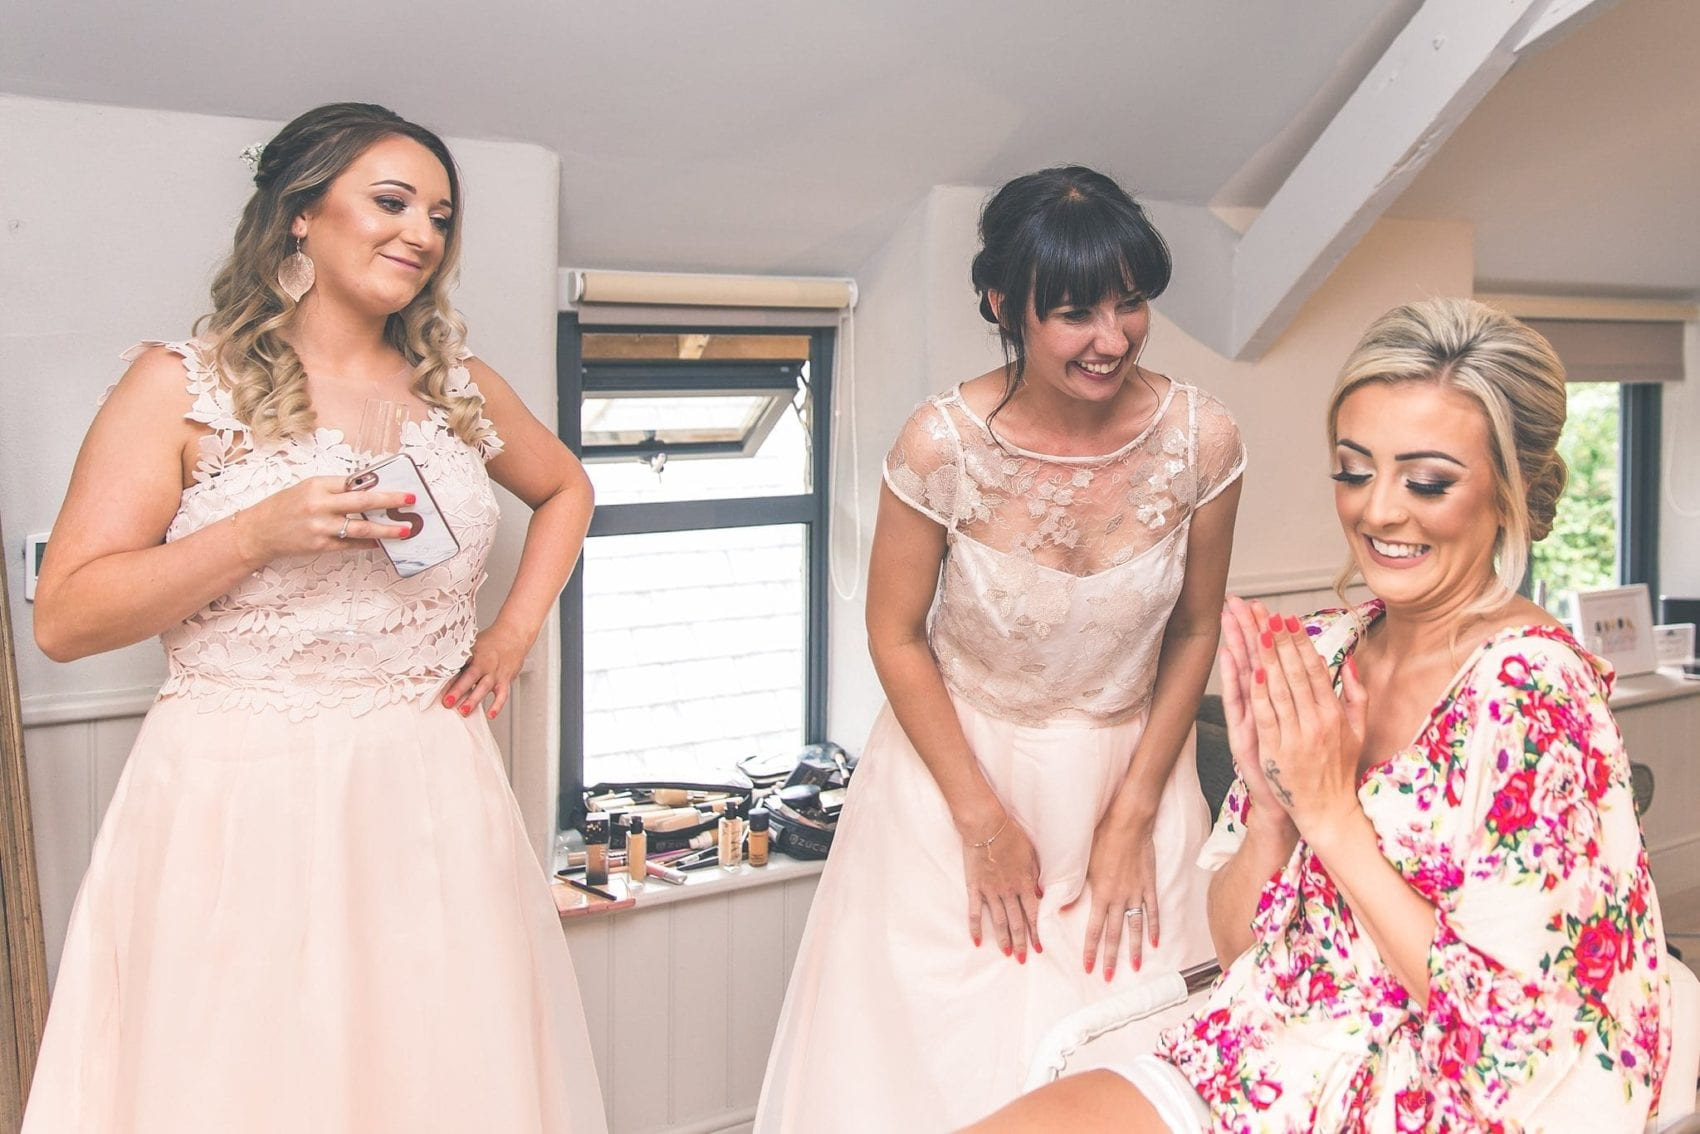 bride, bridesmaids, getting ready, dresses, hair & Makeup, wedding dress